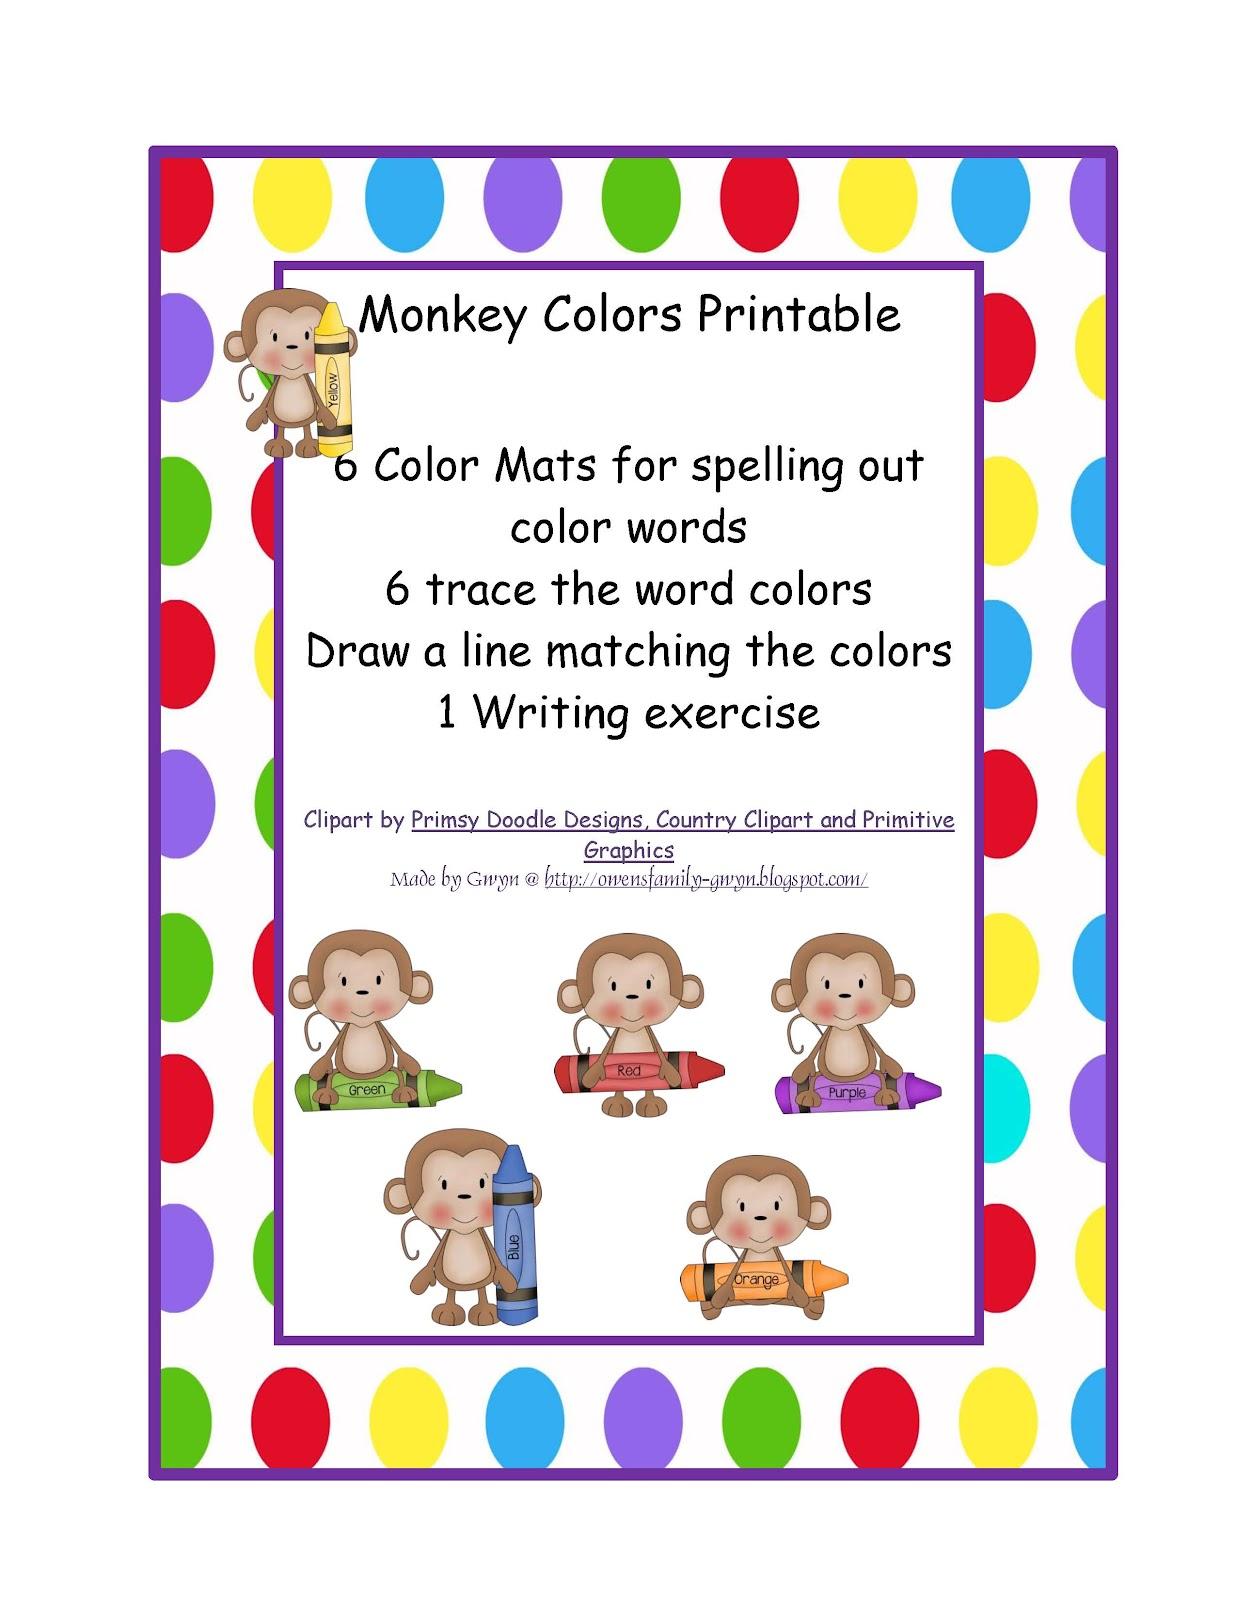 Preschool Printables July 2012